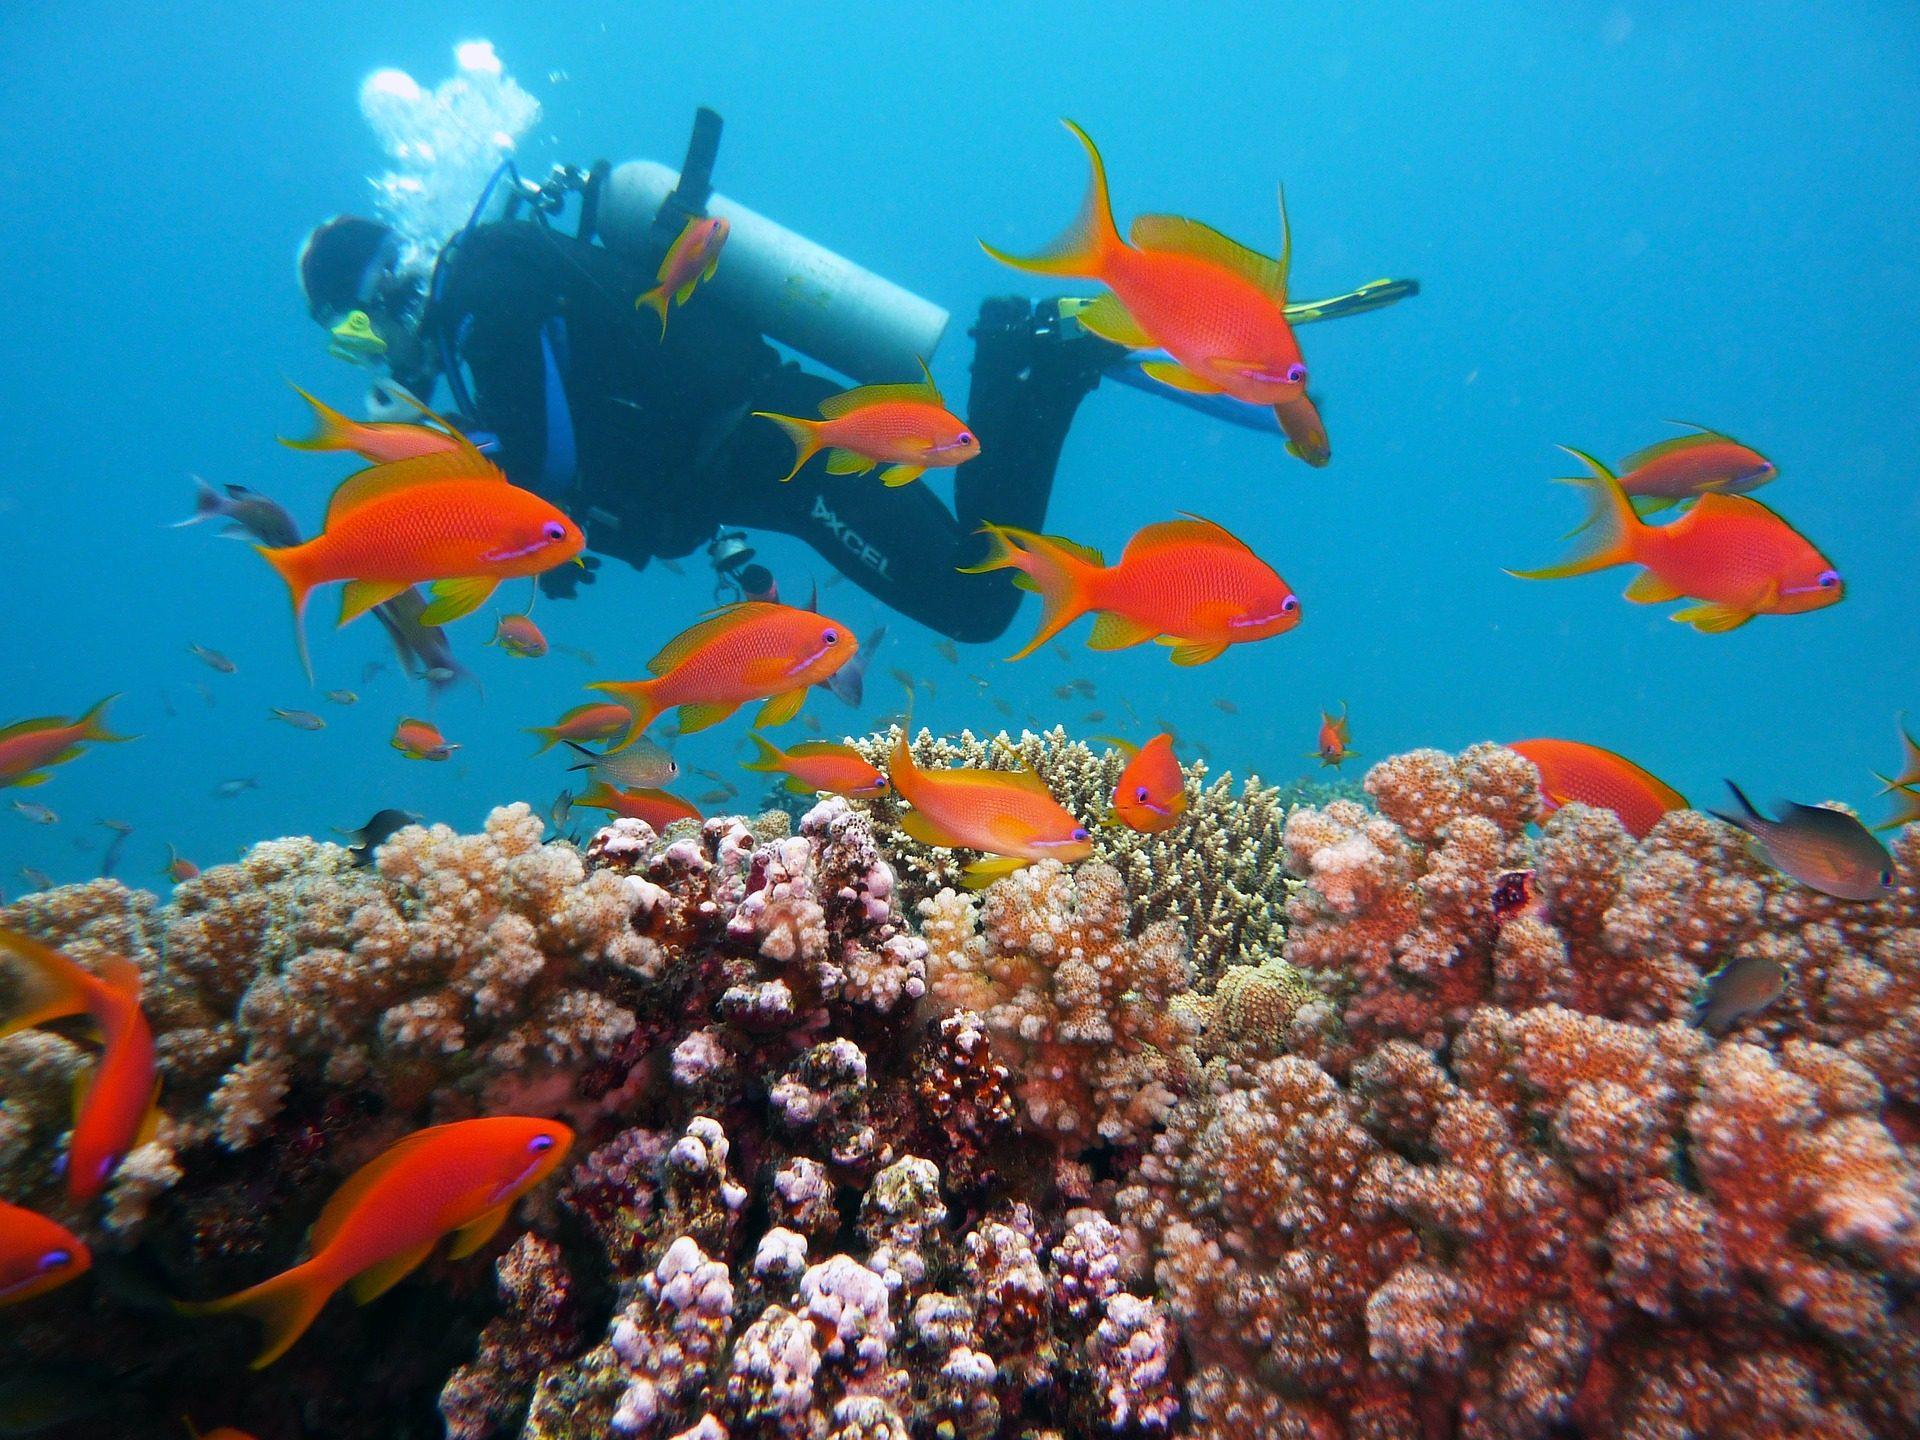 Hurghada Tauchen in Ägypten - Tauch ins Rote Meer